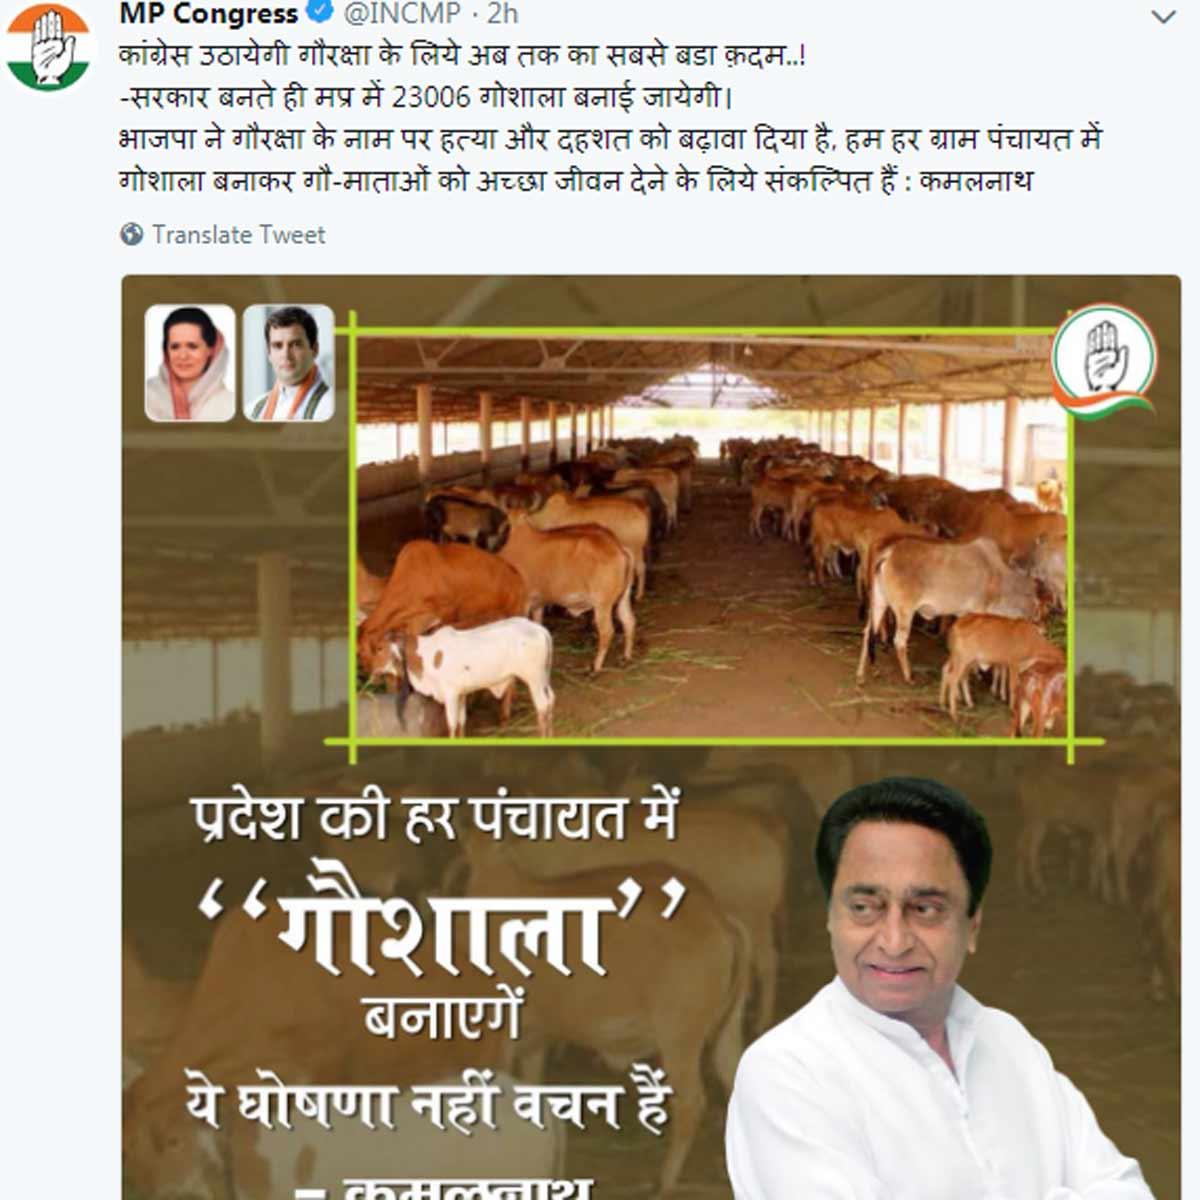 kamal-nath-cow-mp-congres-tweet